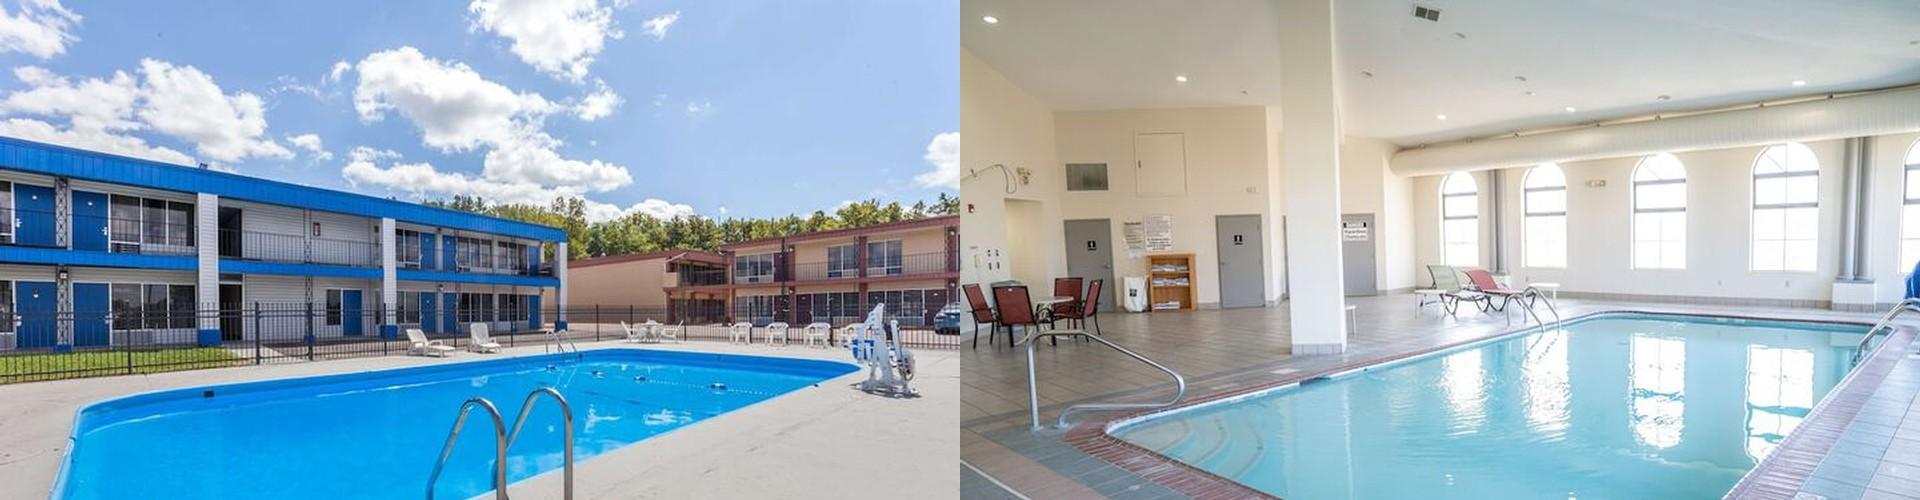 Hotels Near Seymour Indiana Good Quality Inn With